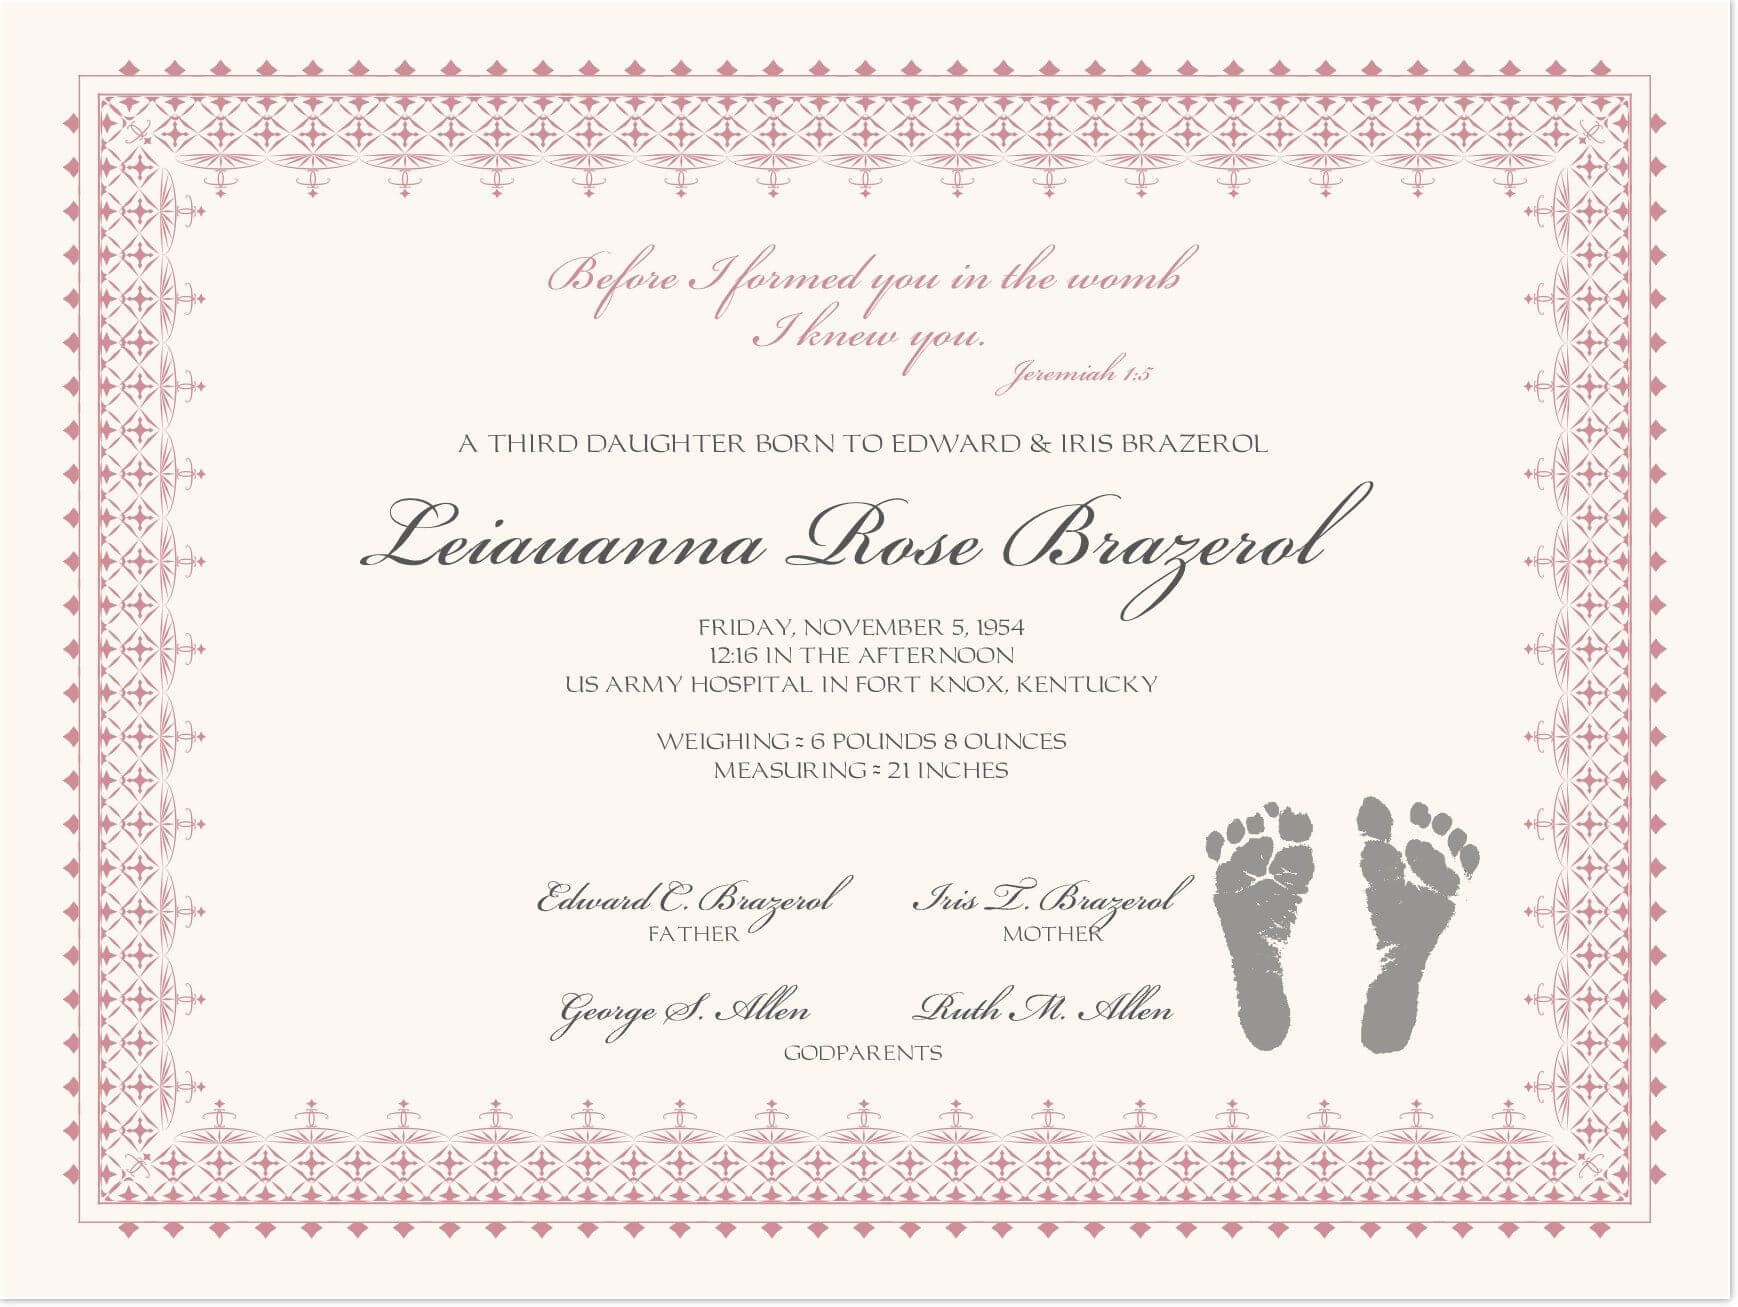 Footprints Baby Certificates | Birth Certificate Template For Baby Dedication Certificate Template